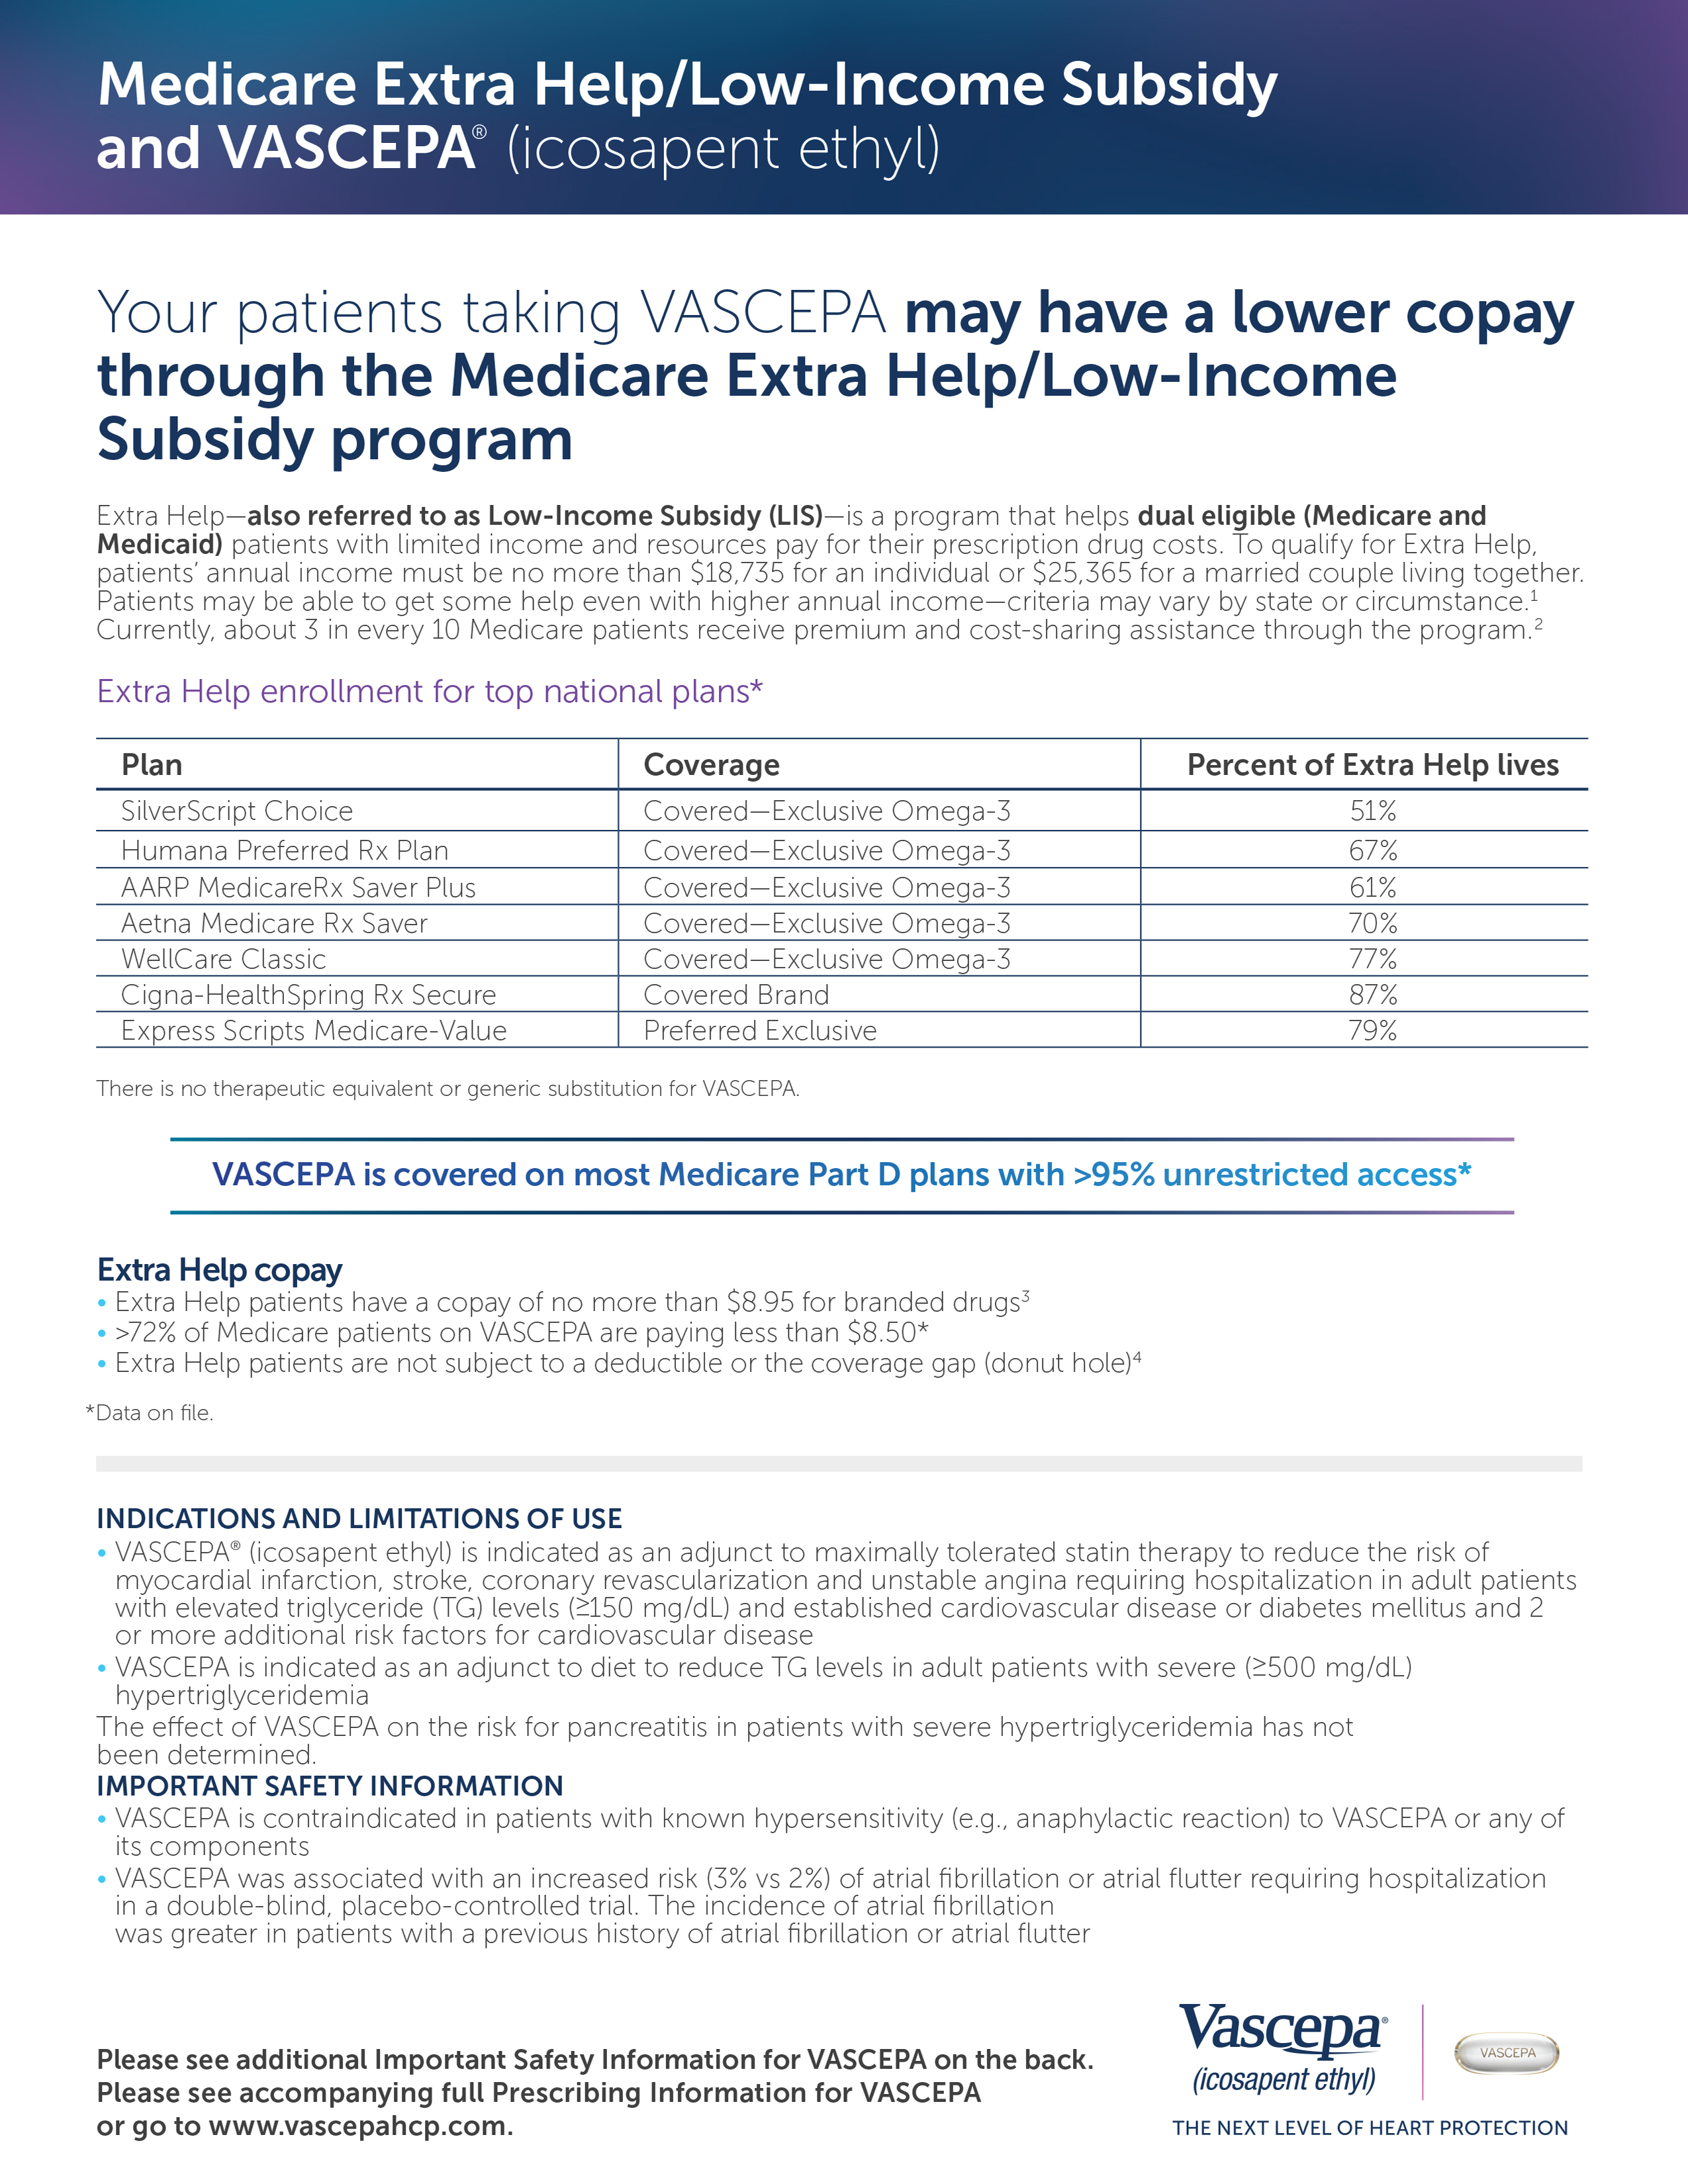 VASCEPA Access and Coverage | VASCEPA® (icosapent ethyl)